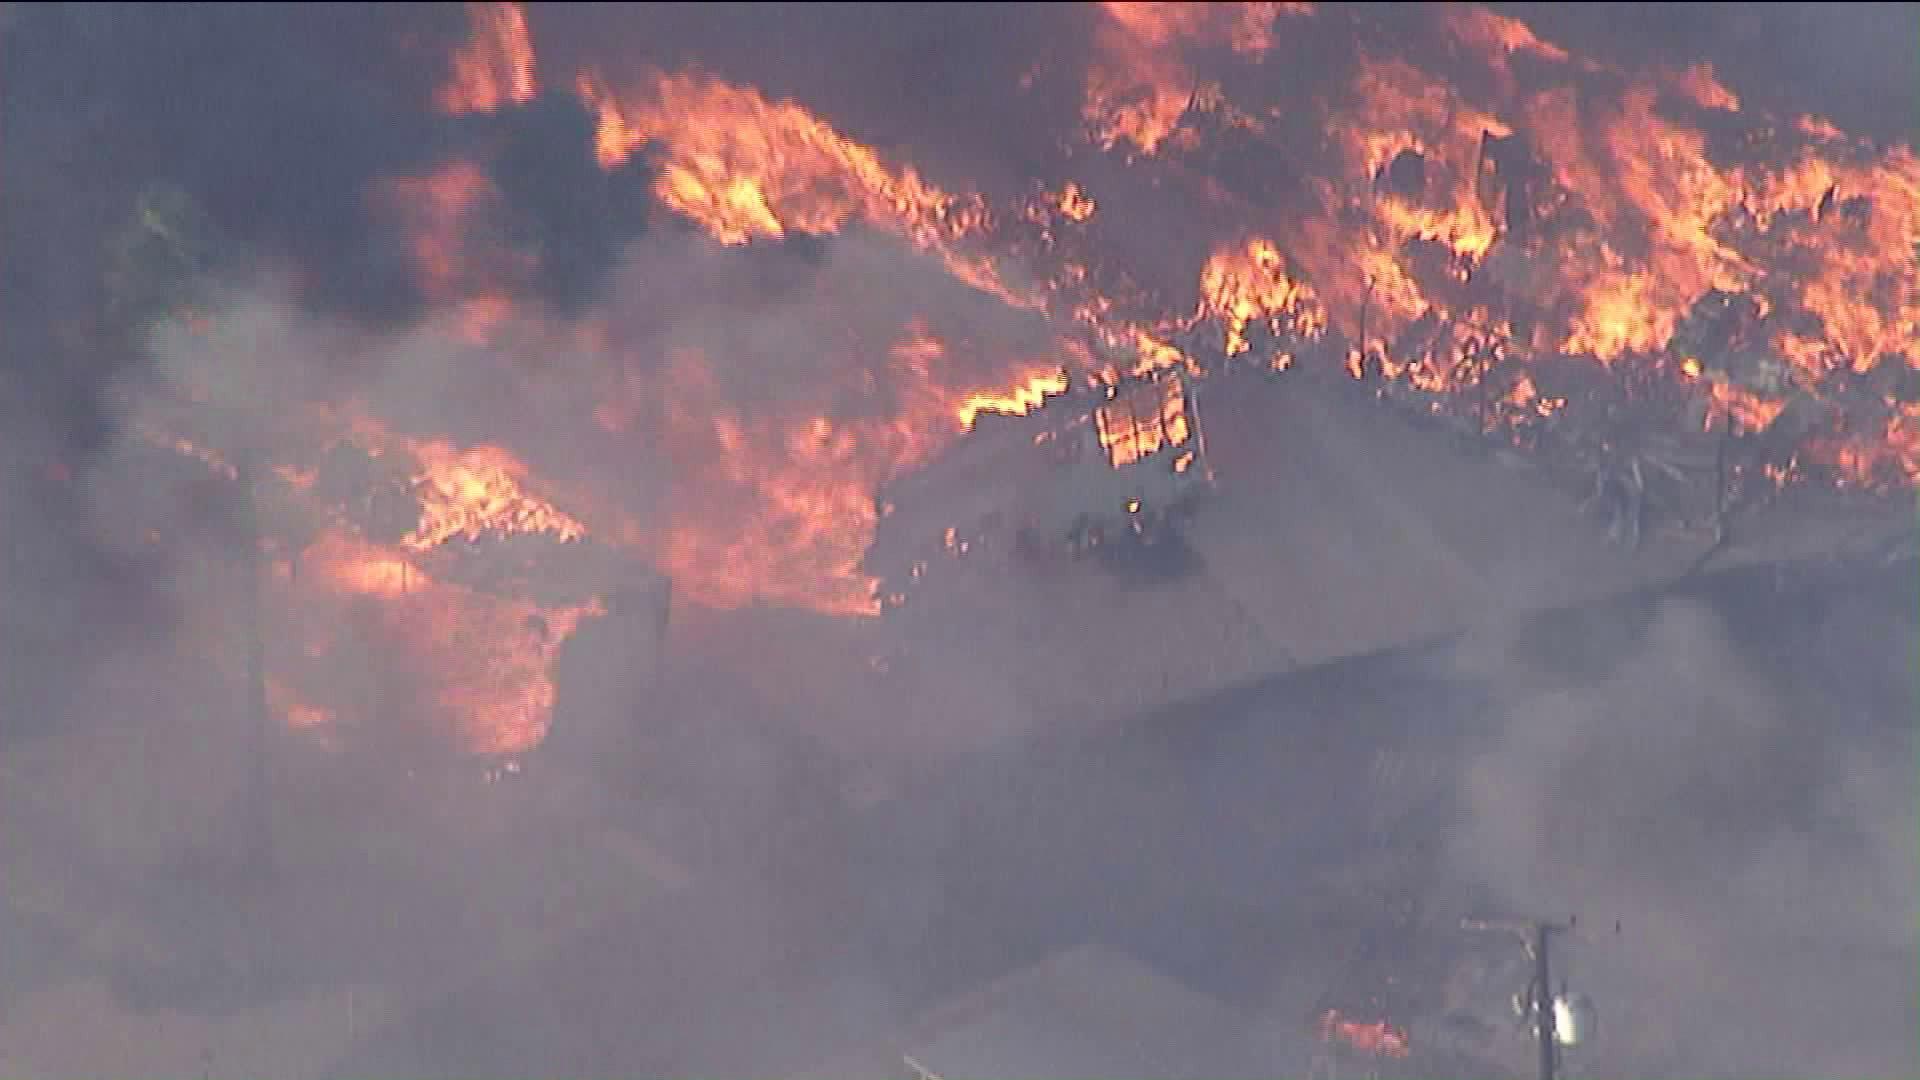 Local News - Blaze Kills Woman, Destroys Dozens of Mobile Homes in Calimesa